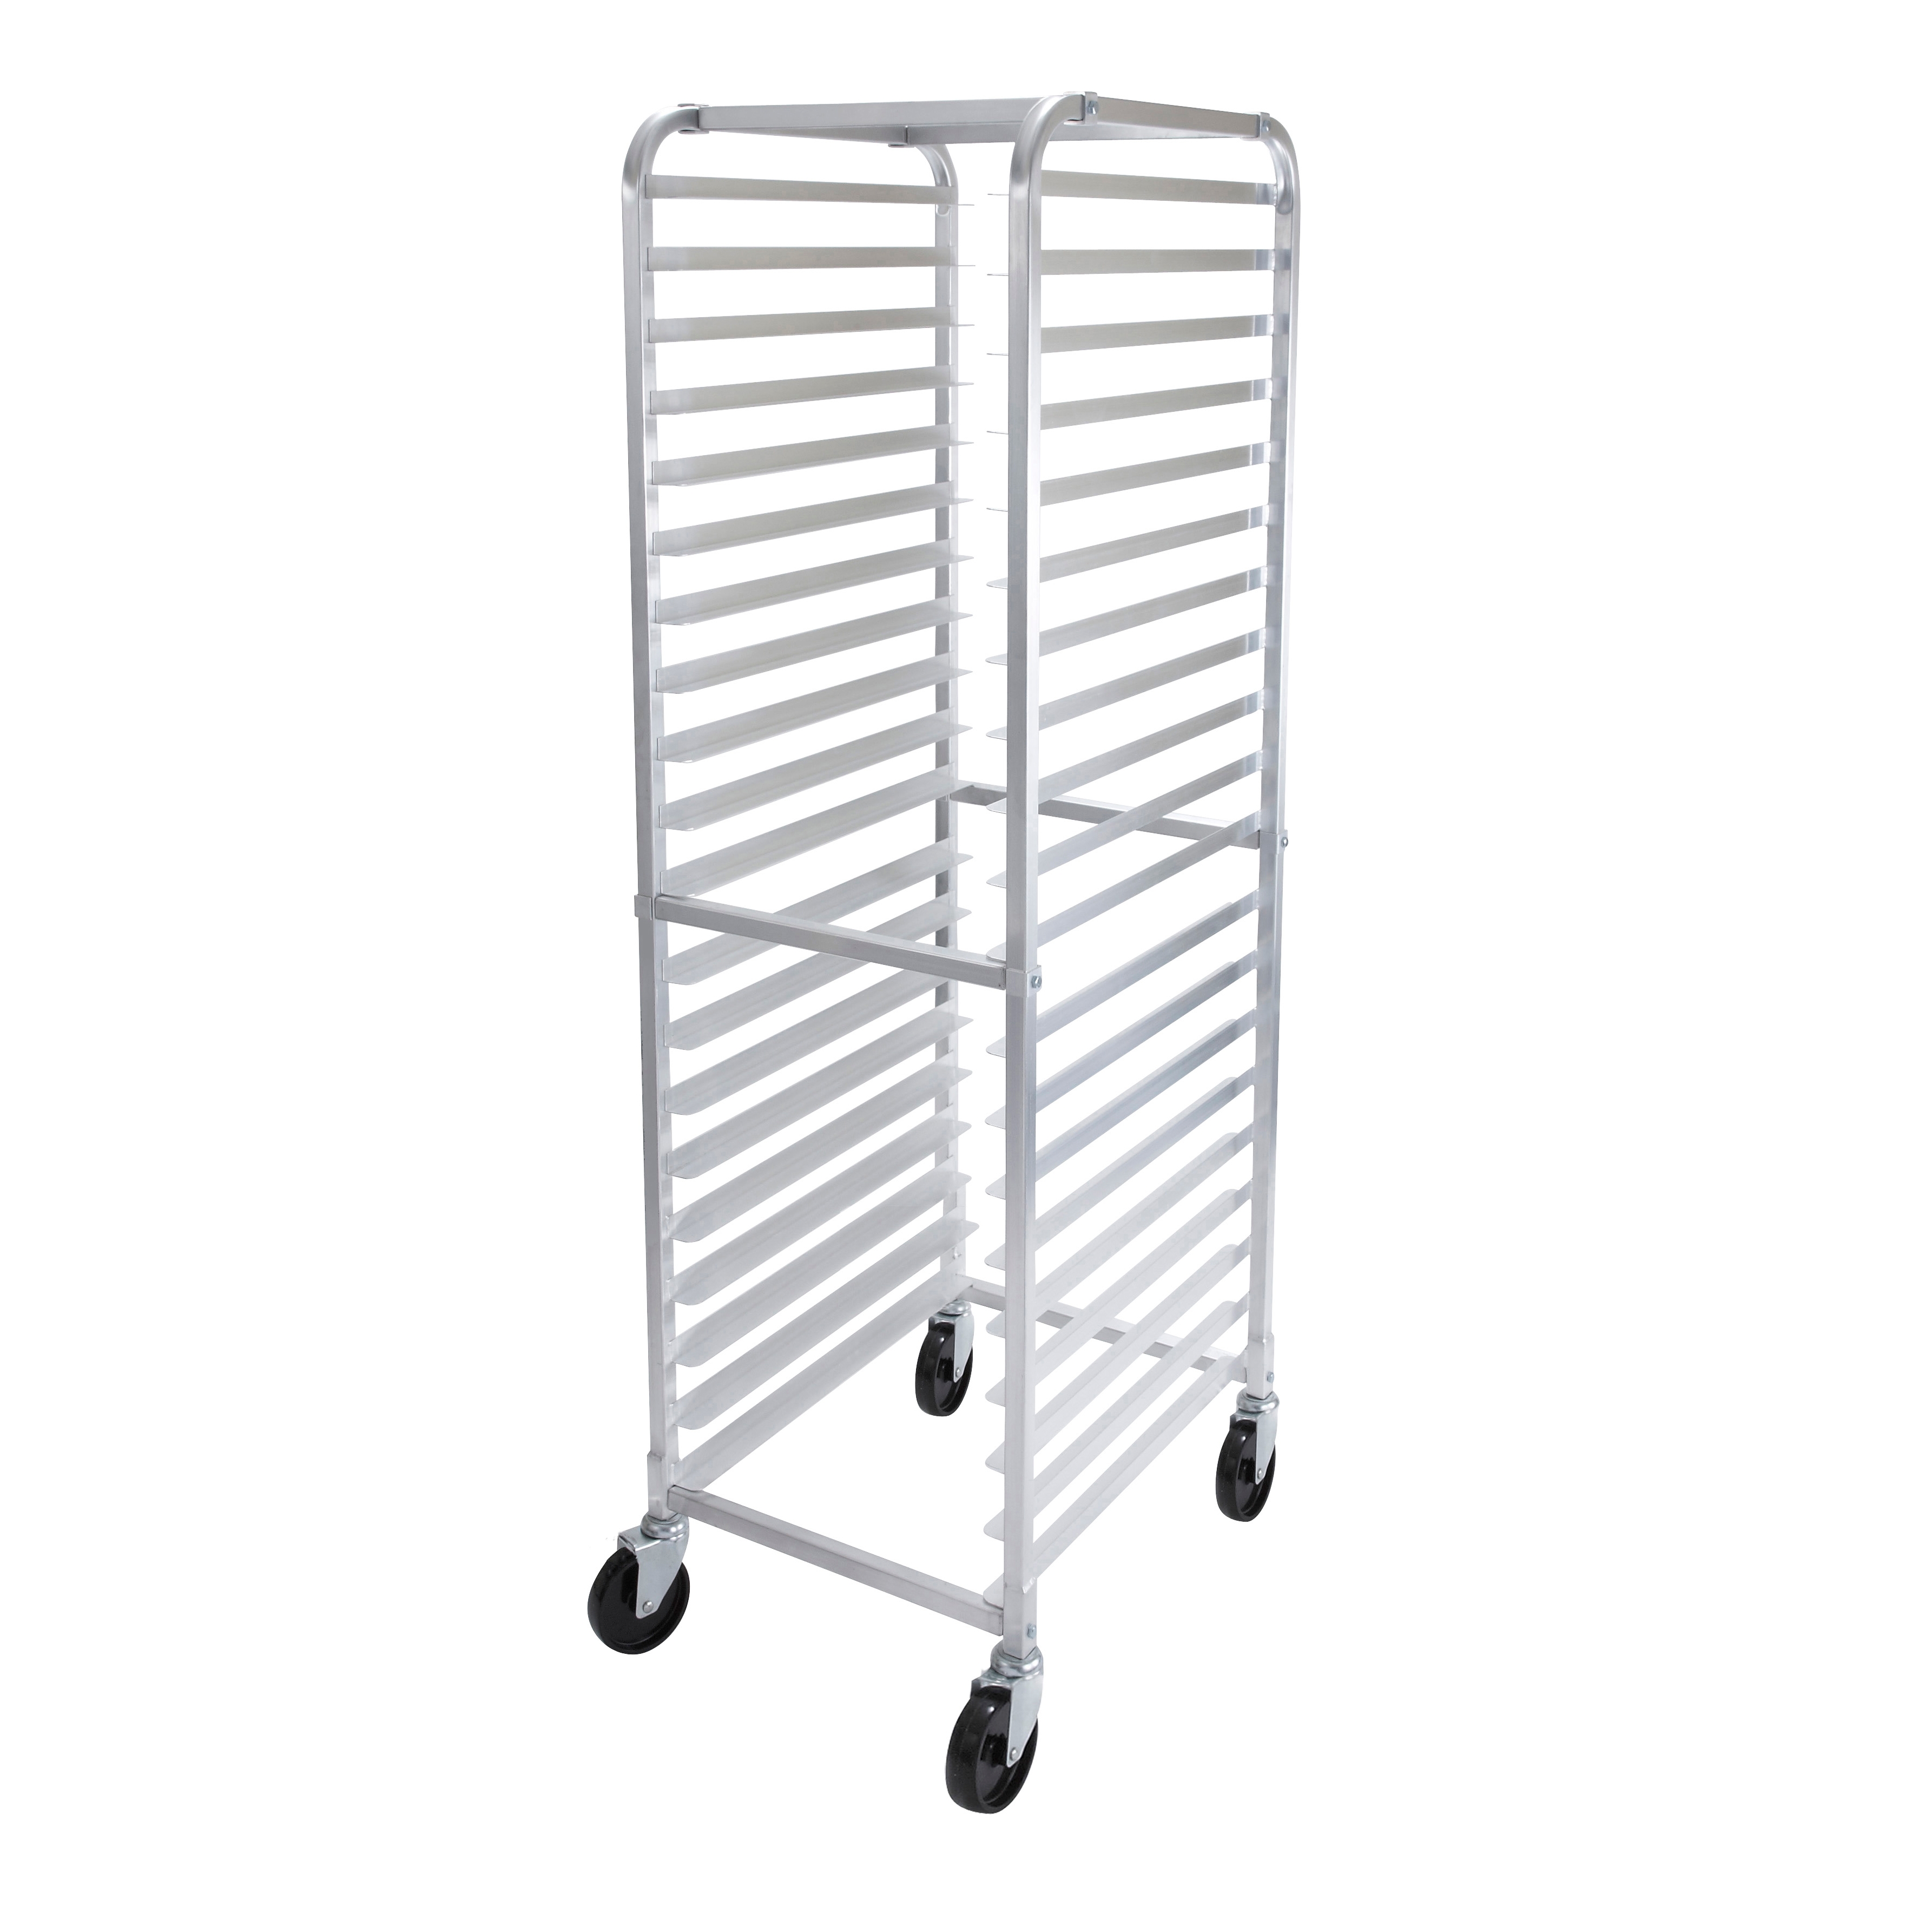 Winco ALRK-20 pan rack, universal